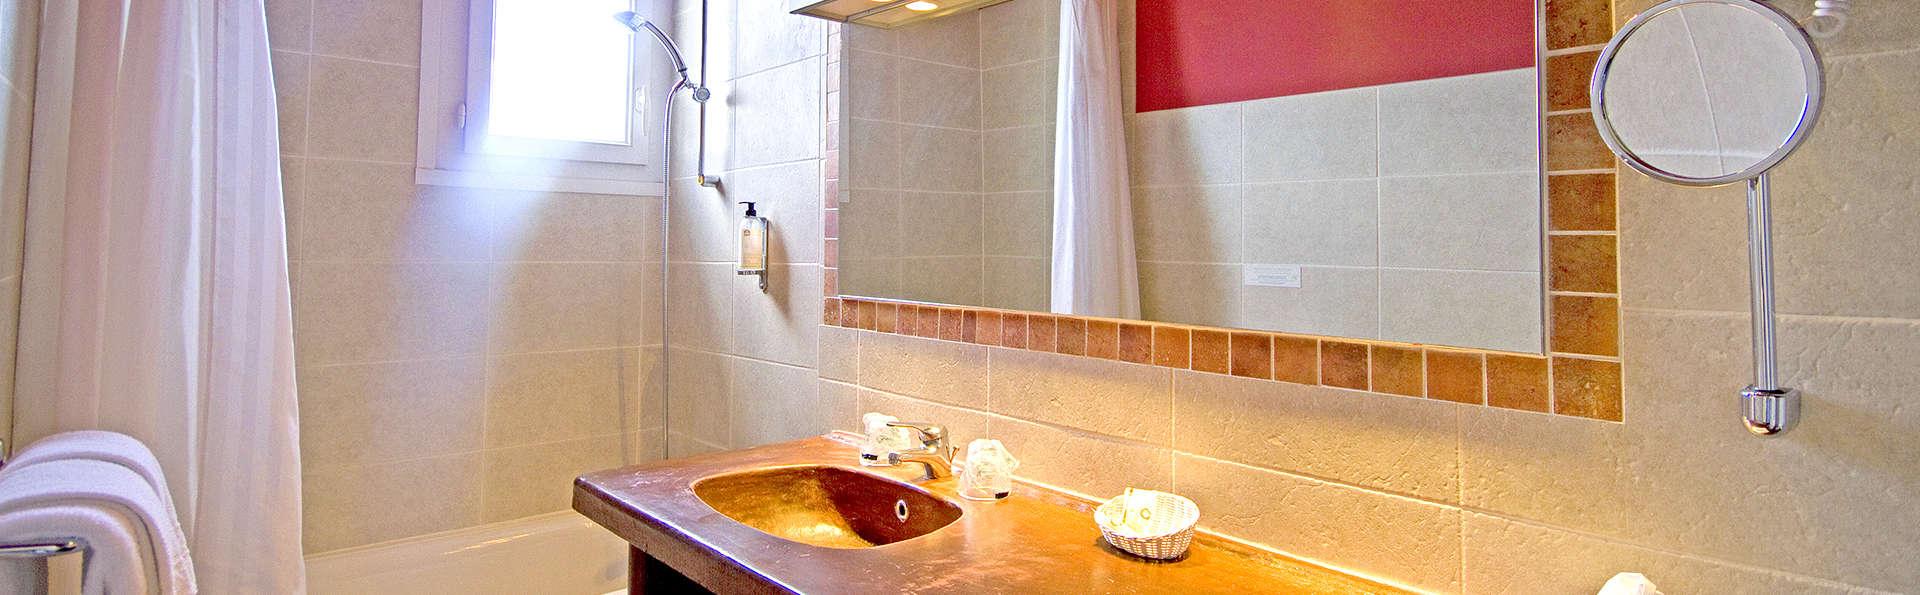 Les Vignes Blanches - Edit_Bathroom3.jpg